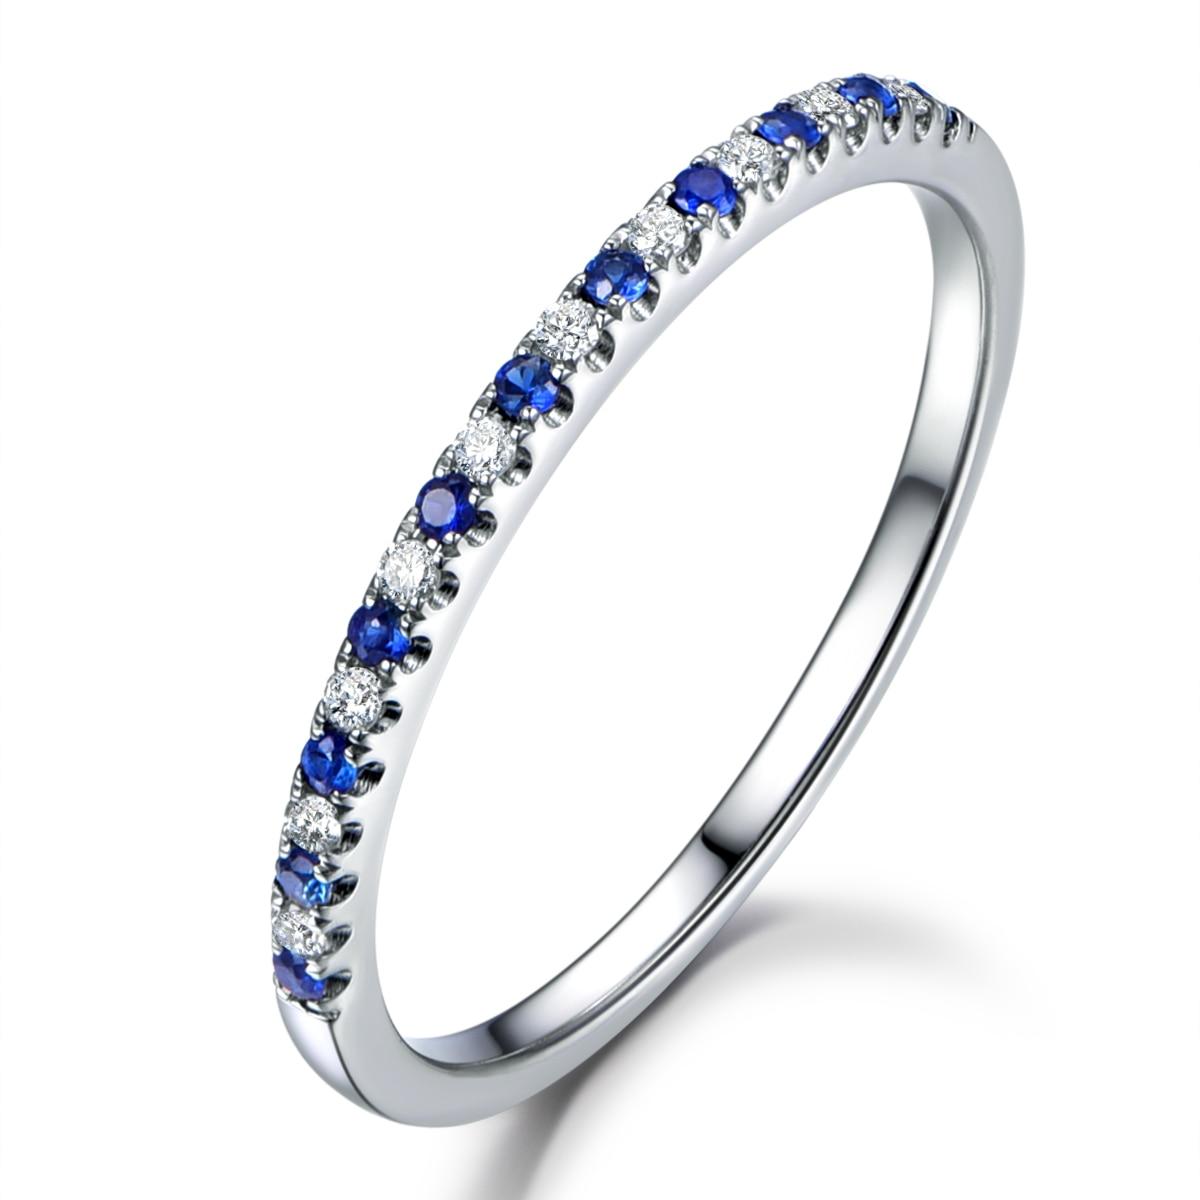 14K Rose Gold Wedding Band Diamond Wedding Band Pave Diamond Ring Eternity Bands